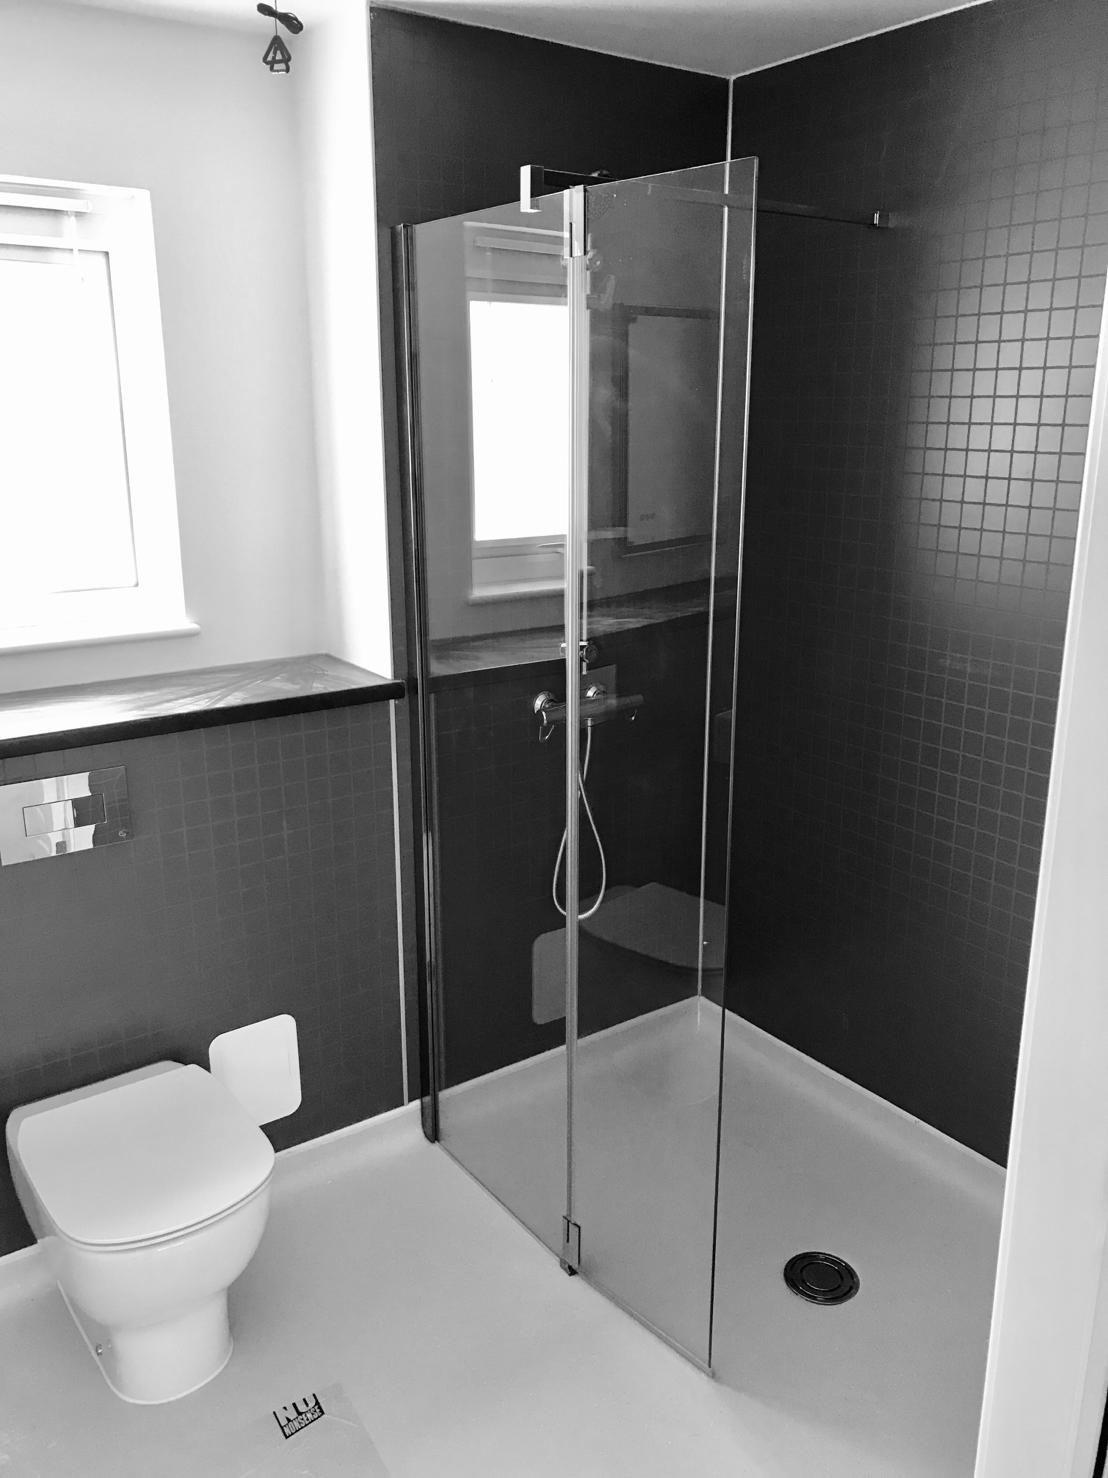 Housing 21 retirement living Modular Bungalows - Bathroom shower - Ward Court